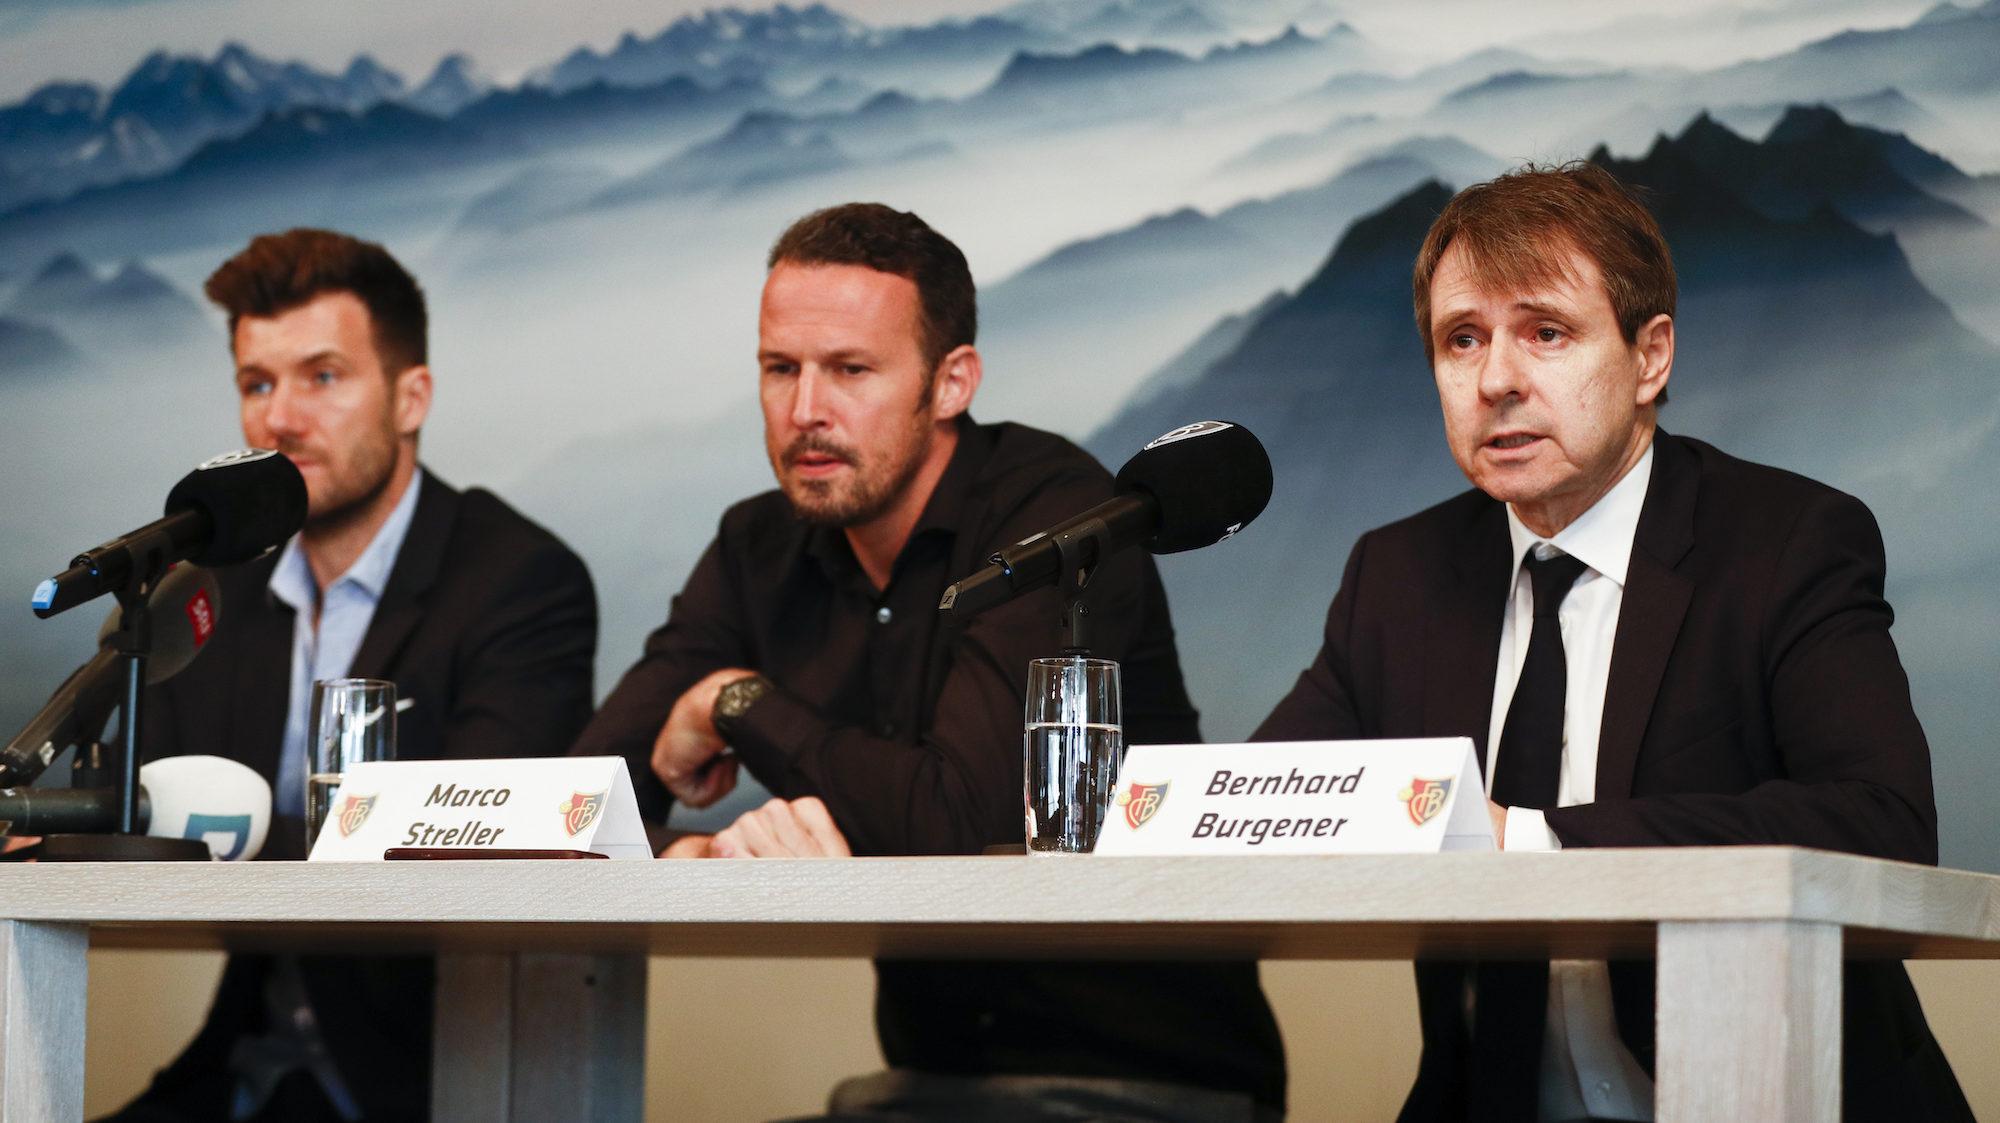 20.05.2018; Basel; Fussball Super League - FC Basel Saisonbilanz Medienkonferenz; Trainer Raphael Wicky, Sportchef Marco Str